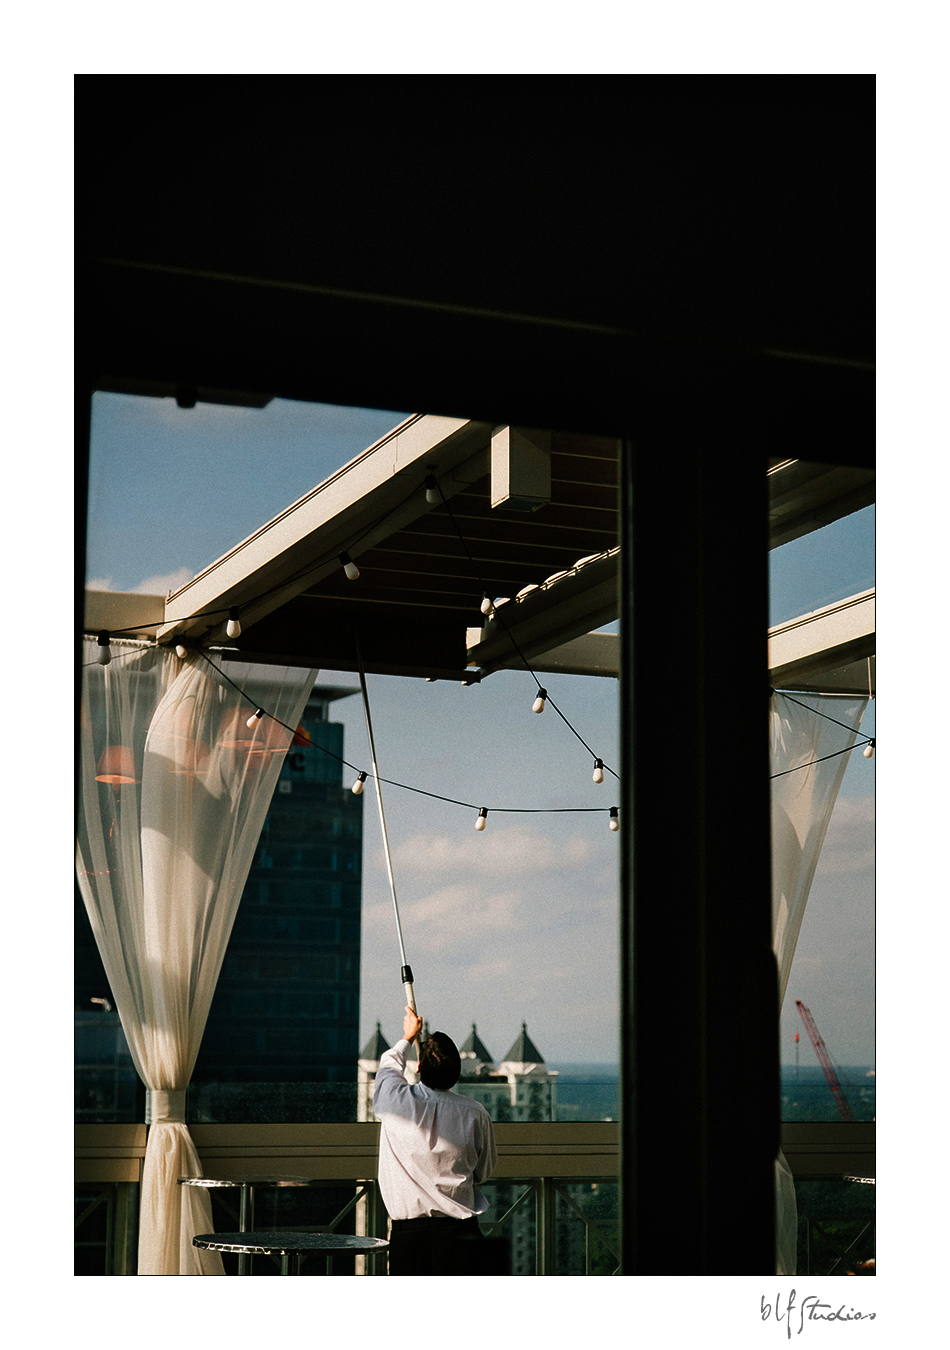 0003-blfstudios-wedding-photographer-daniel-danielle-atlanta.jpg